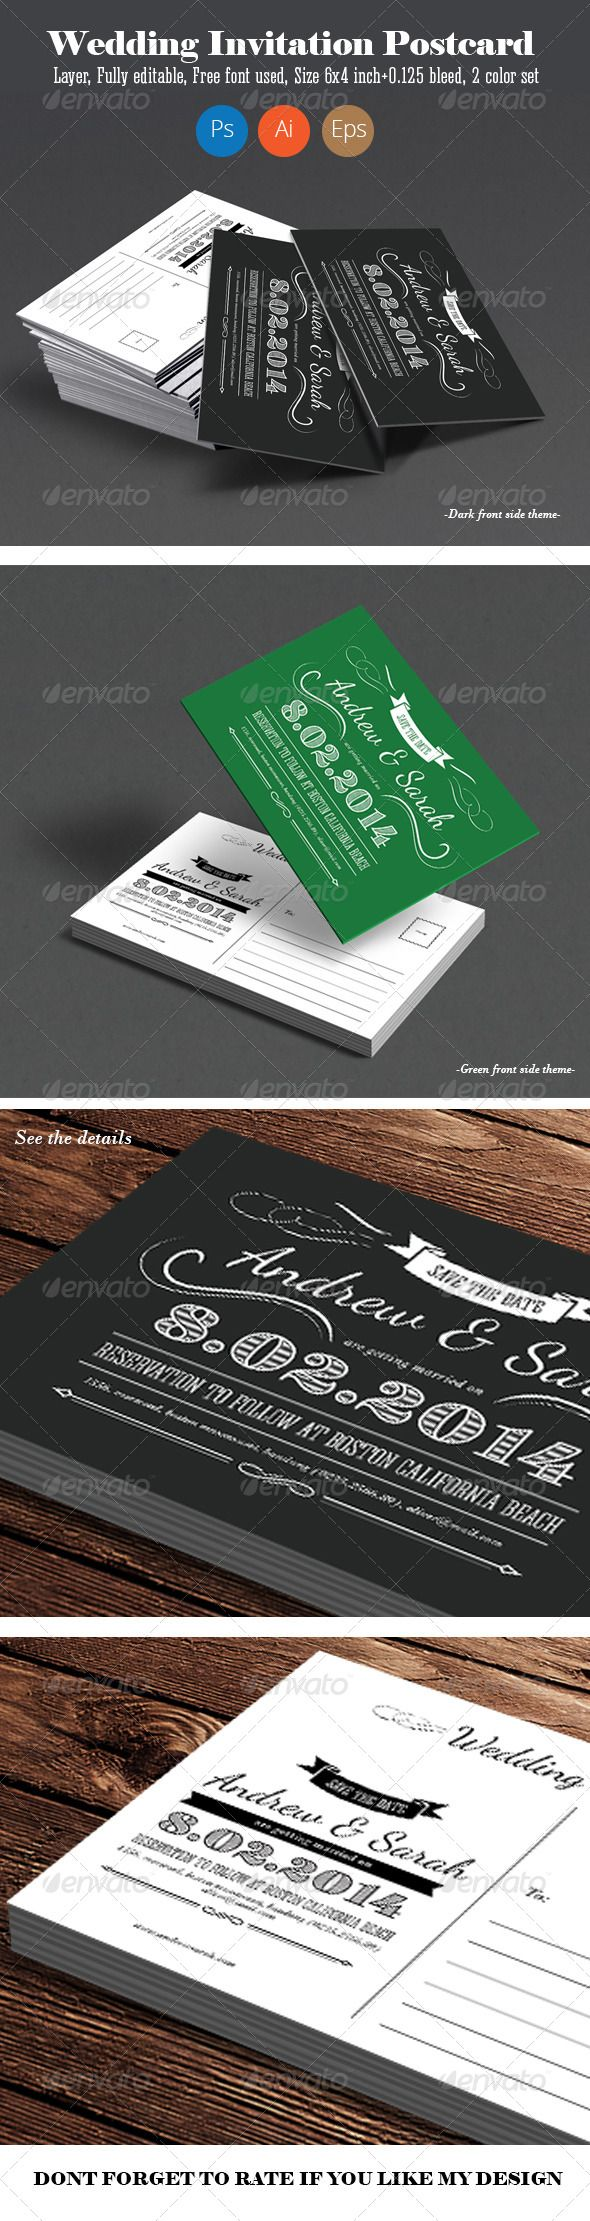 wedding invitation template themeforest%0A Vintage Wedding Invitation Post Card